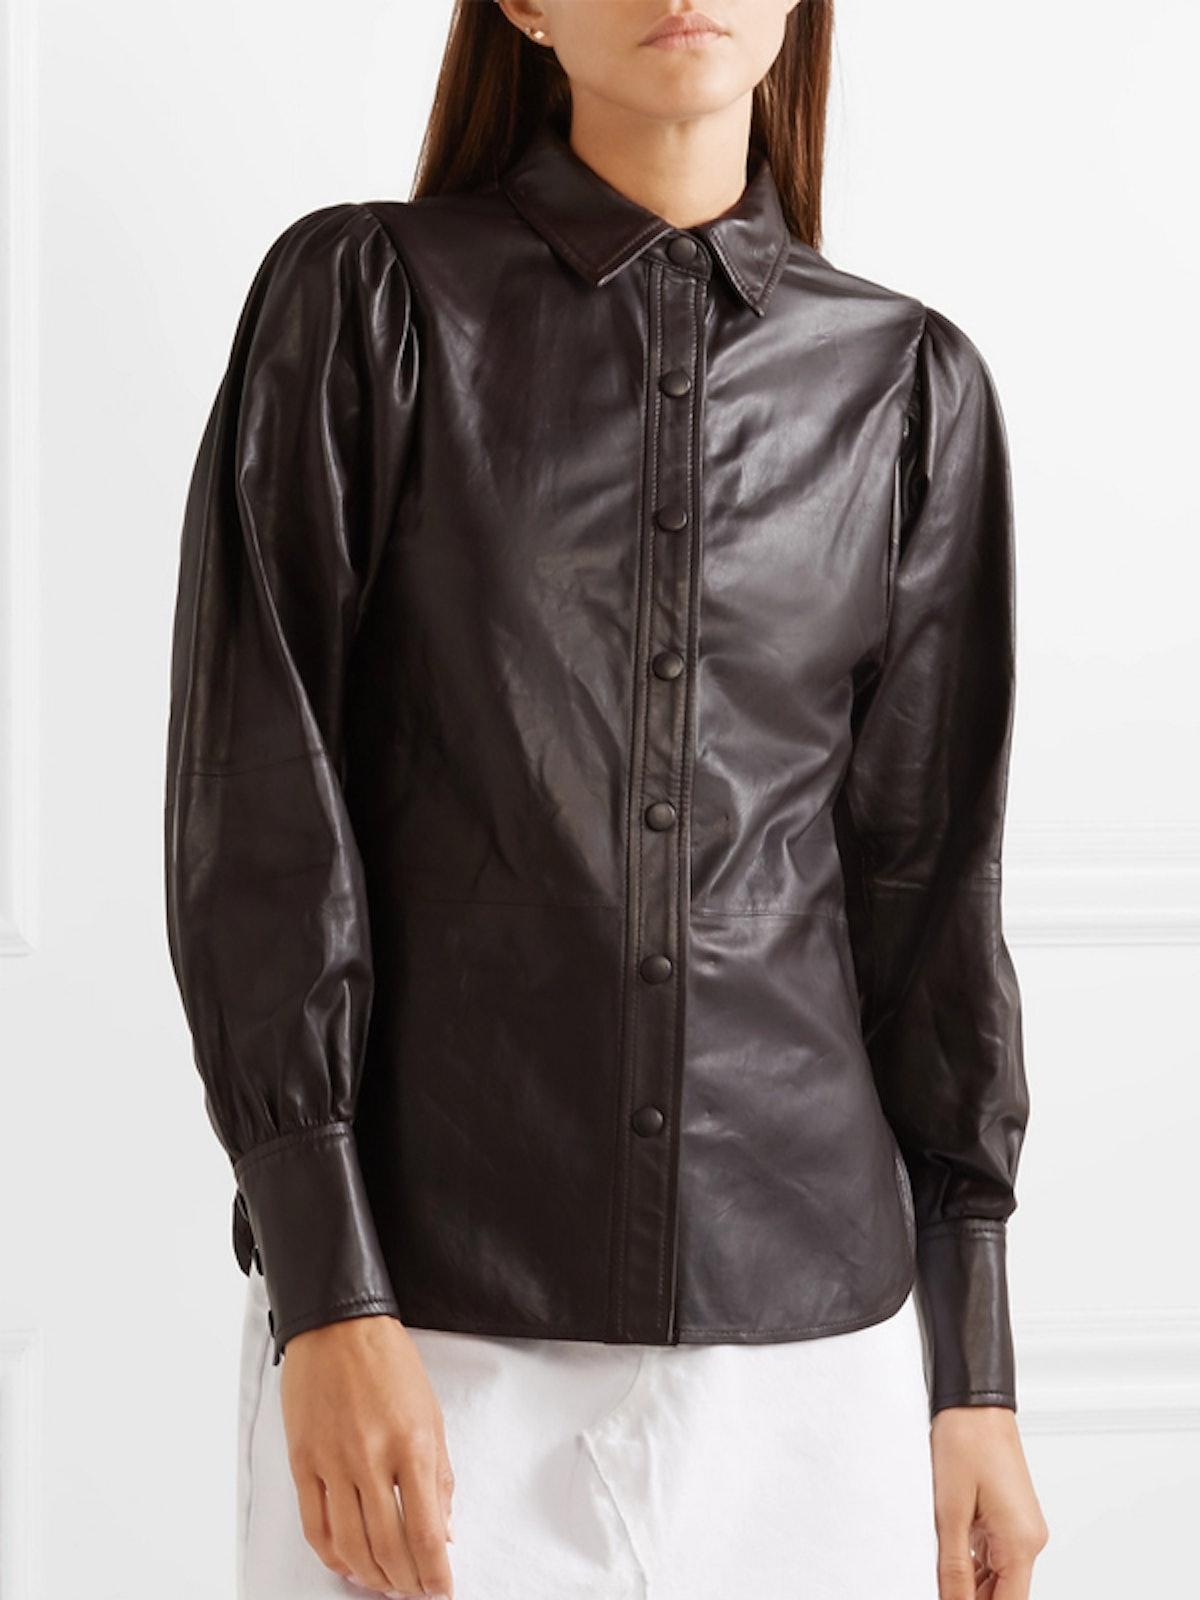 Rhinehart Leather Shirt